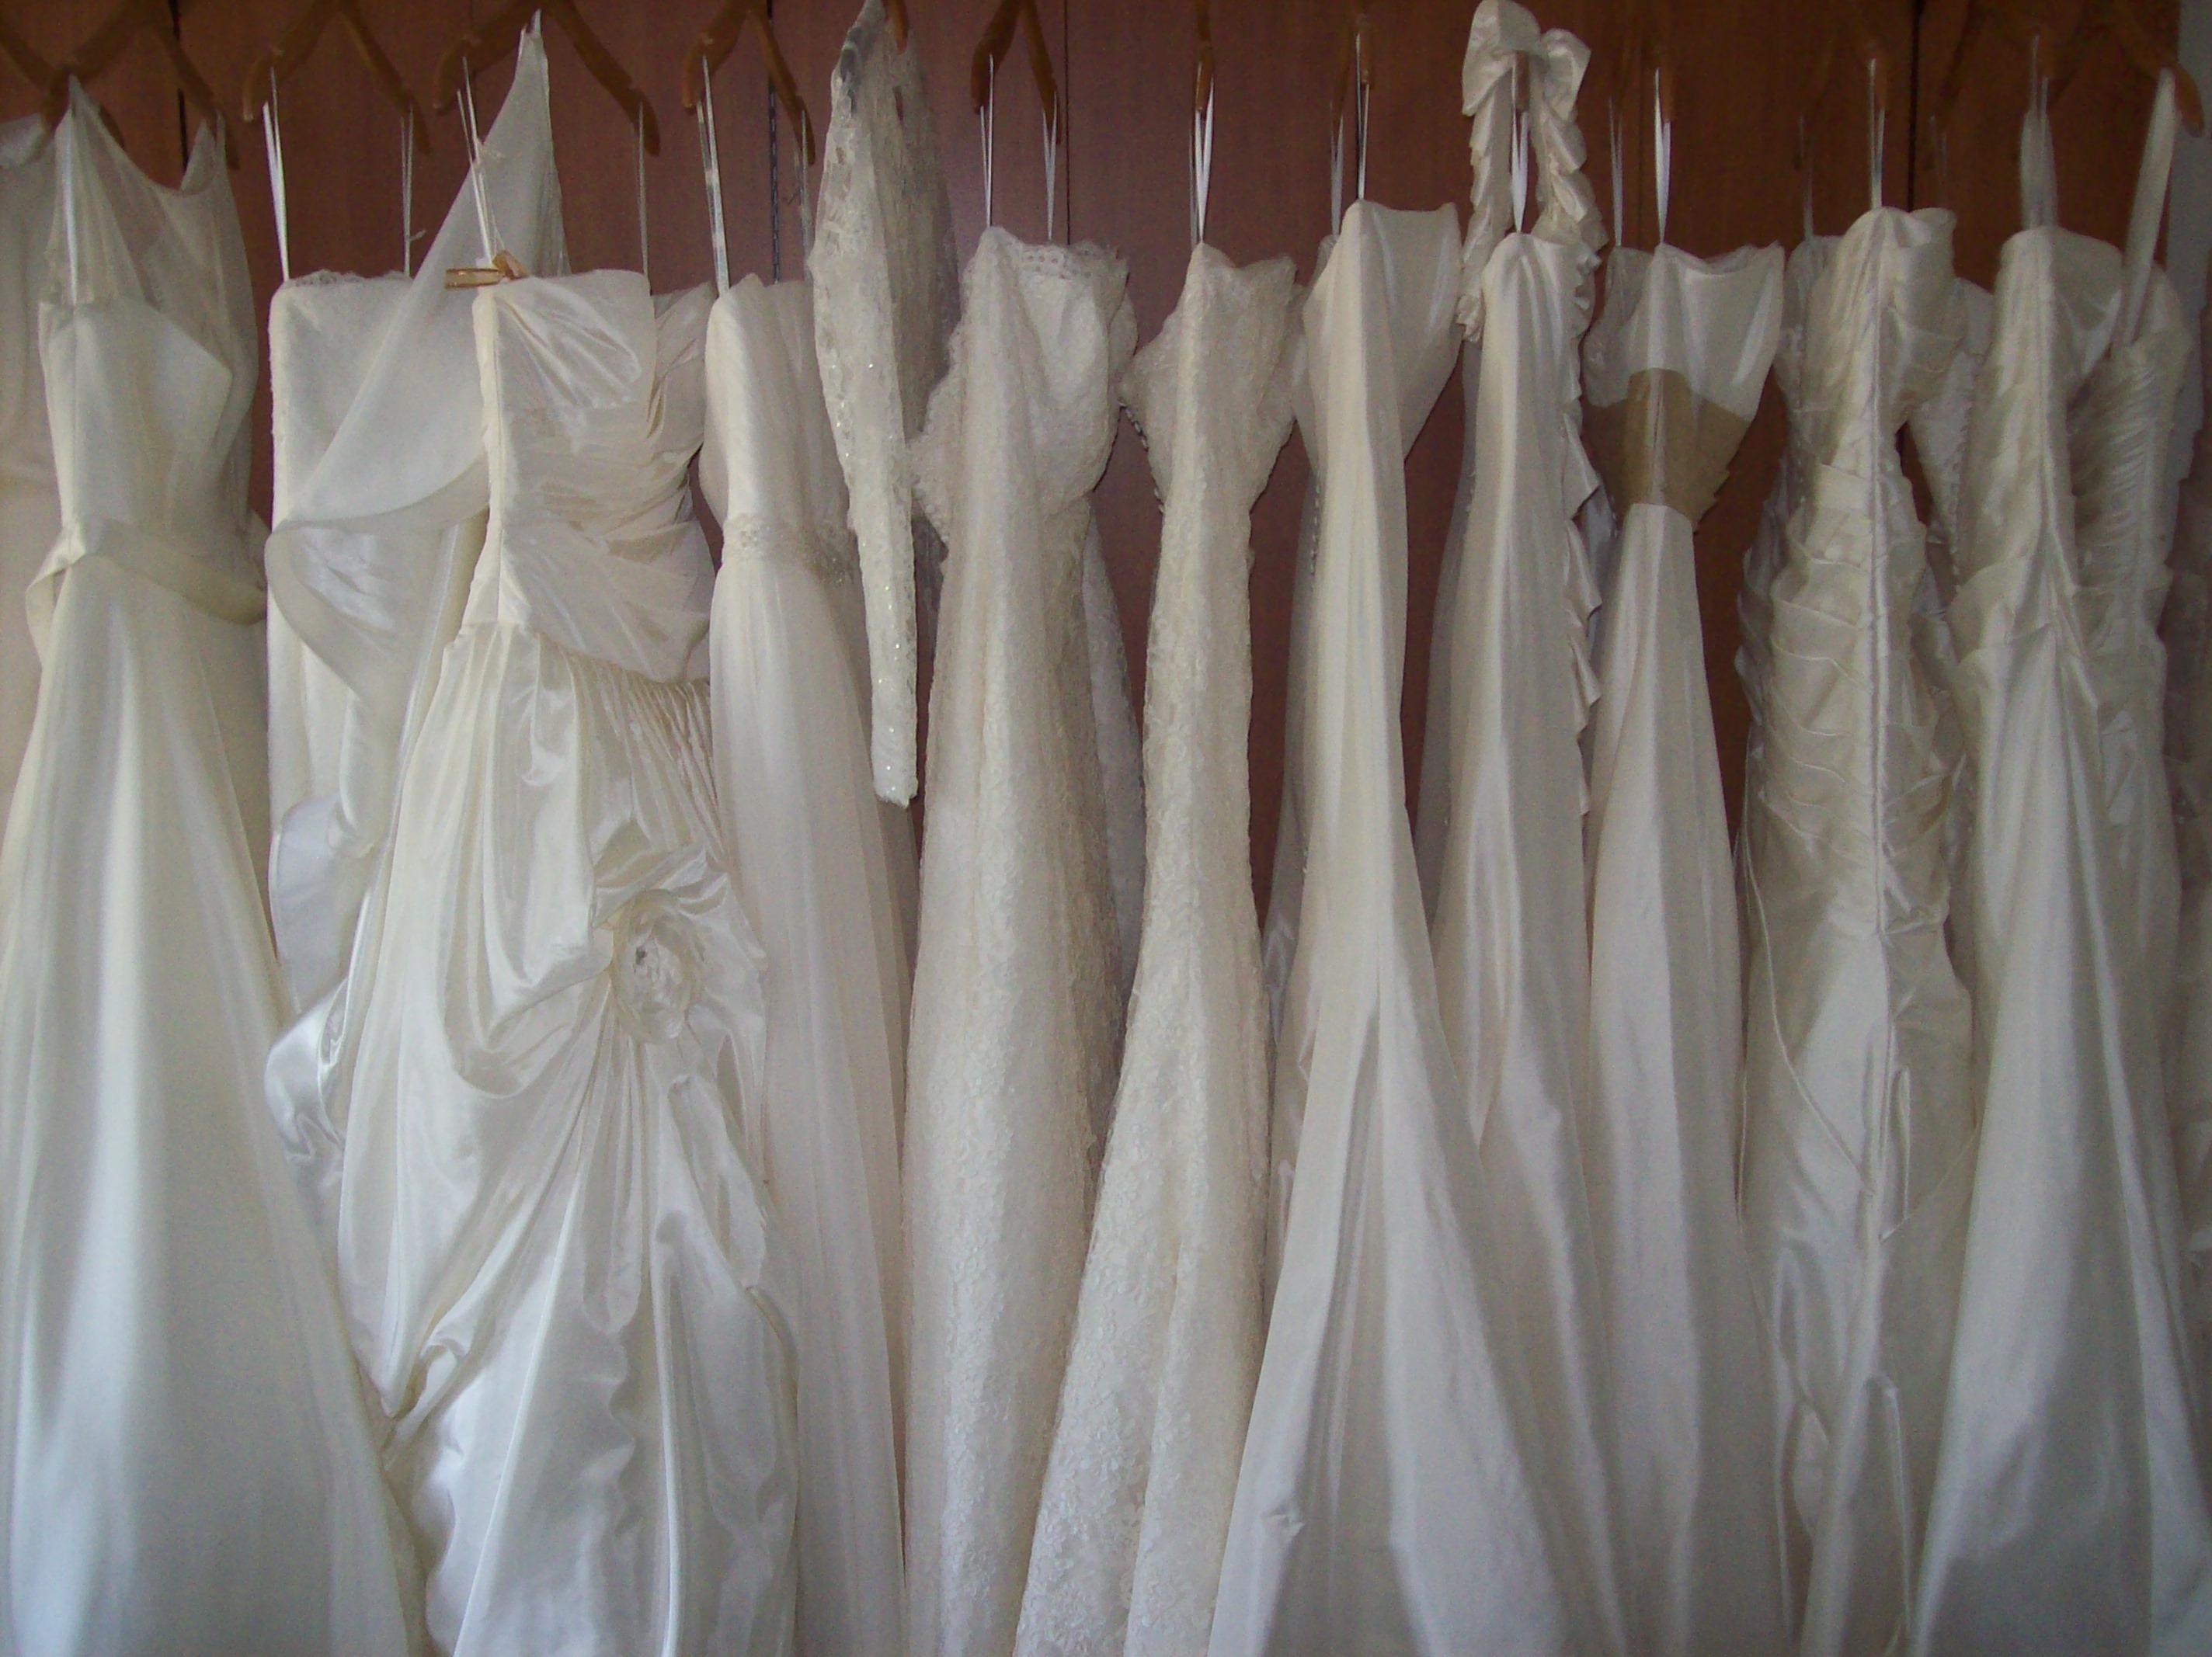 Amore Wedding Dresses - Page 141 of 473 - Bridesmaid Dresses Uk